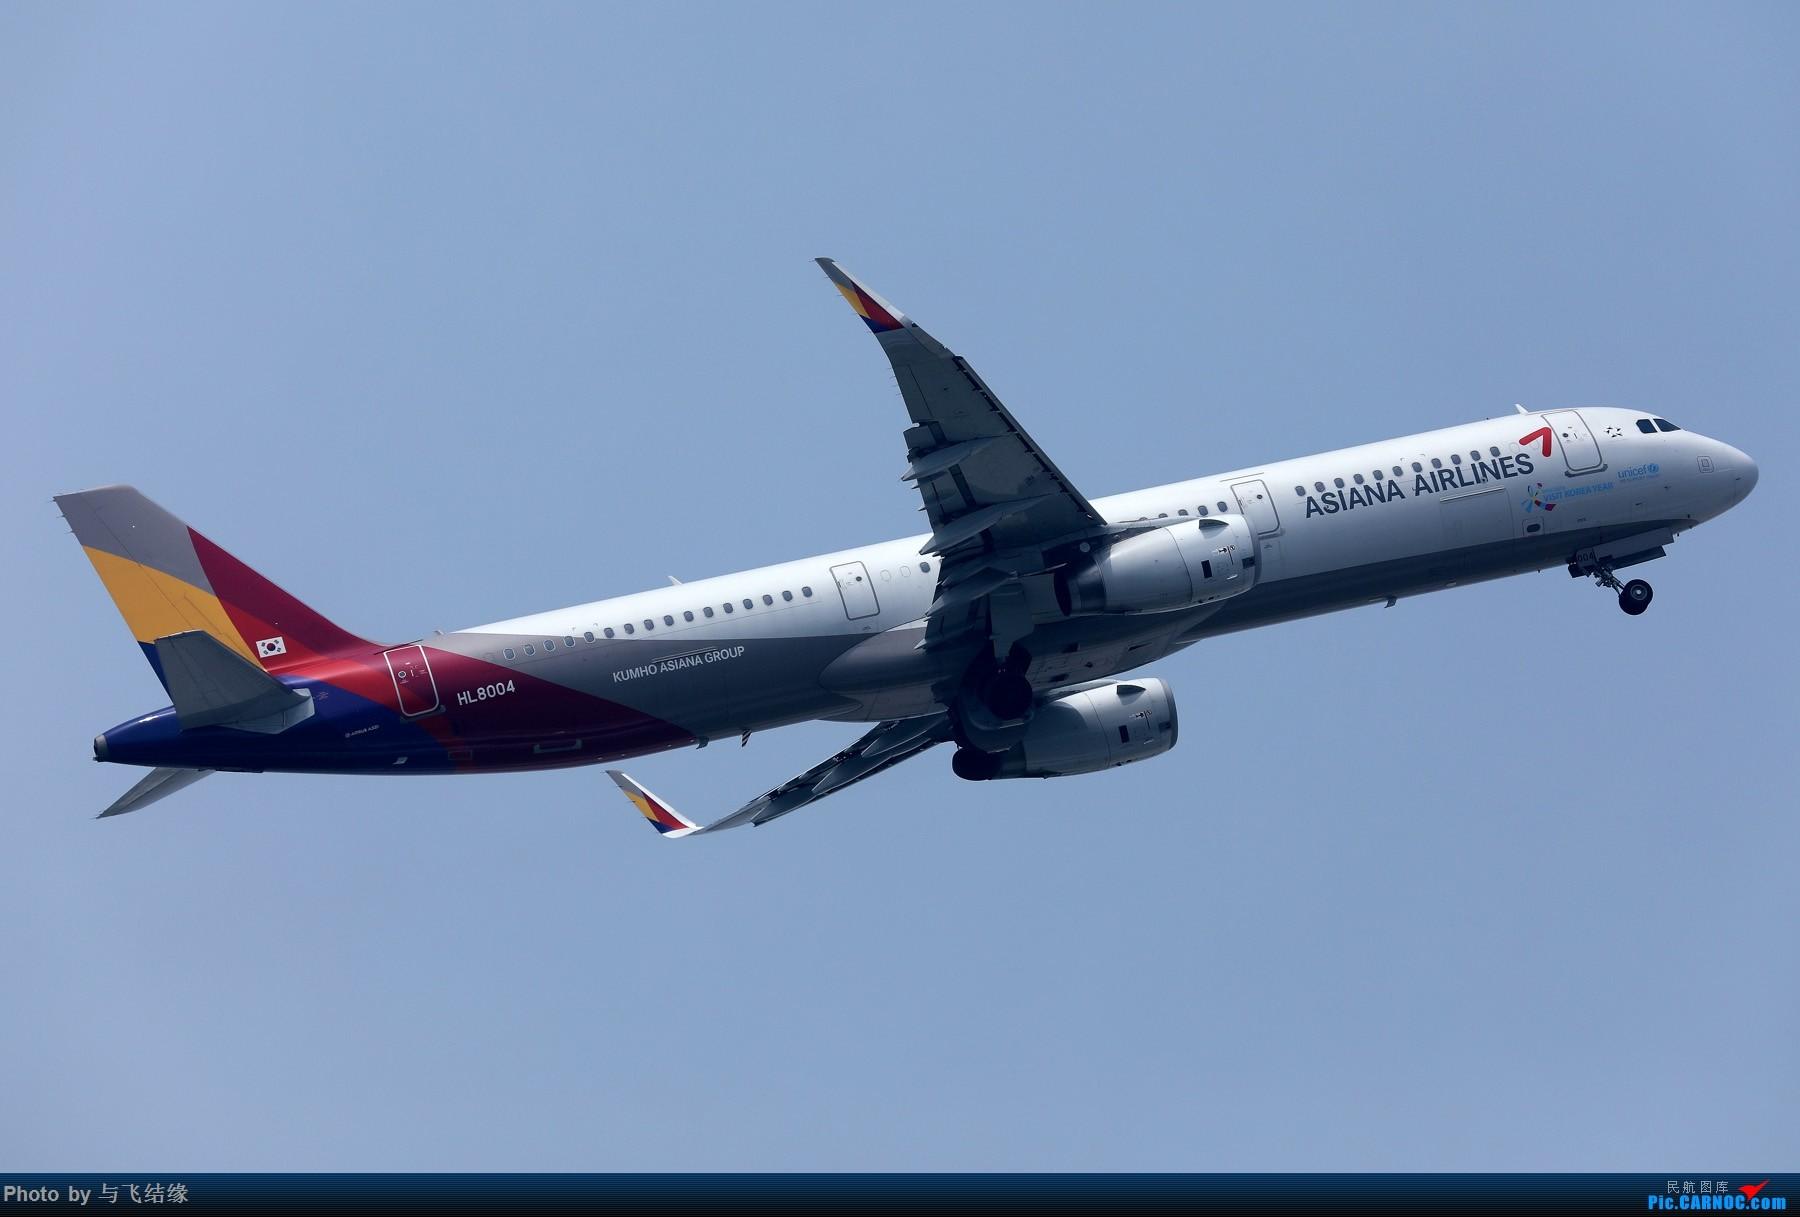 Re:[原创]周末发图一组中外混搭组合! AIRBUS A321-200 HL8004 中国北京首都国际机场